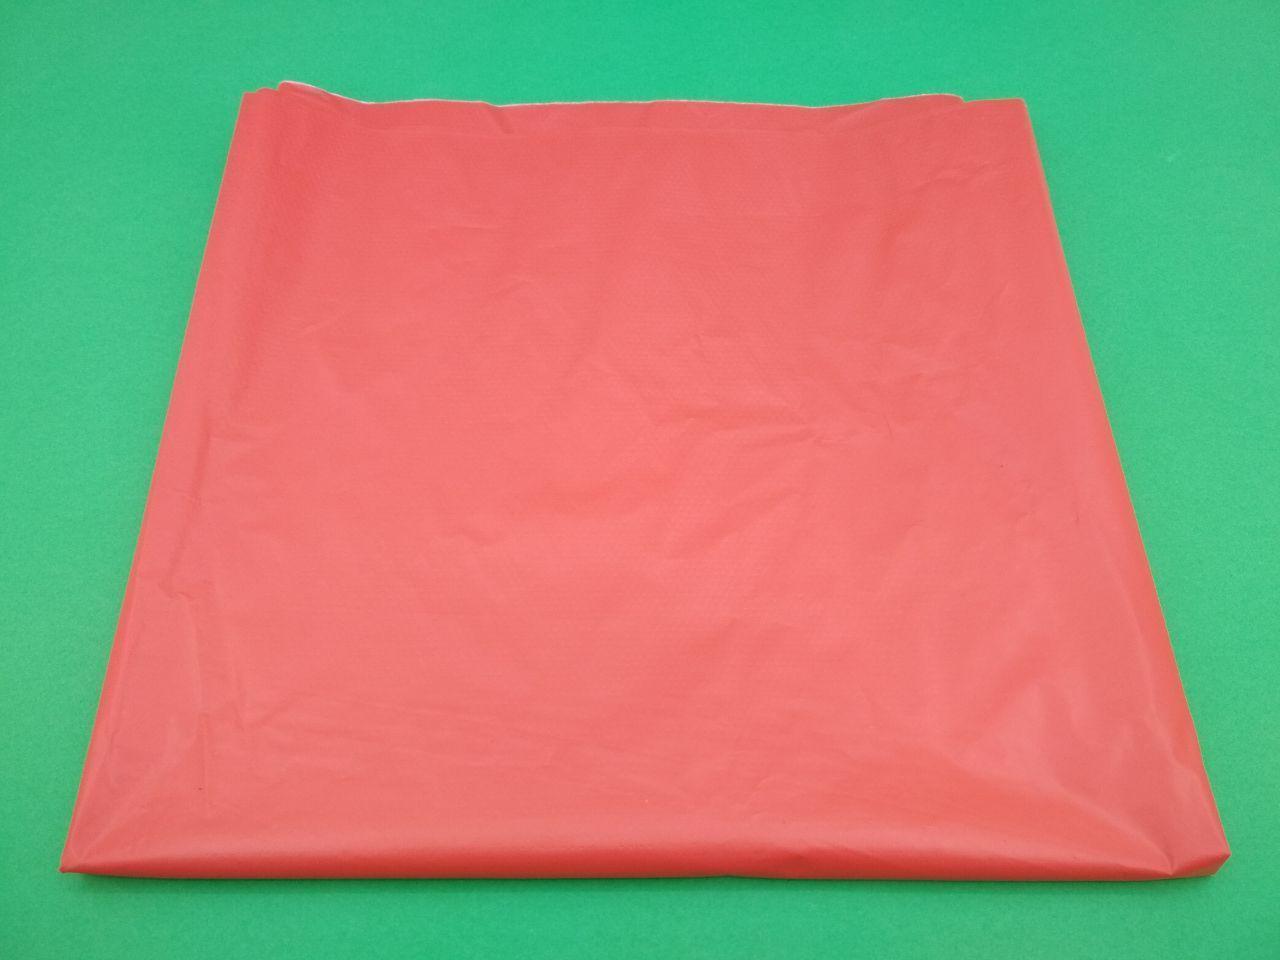 Скатерка (105x200) Однотонная КРАСНАЯ (25 шт)